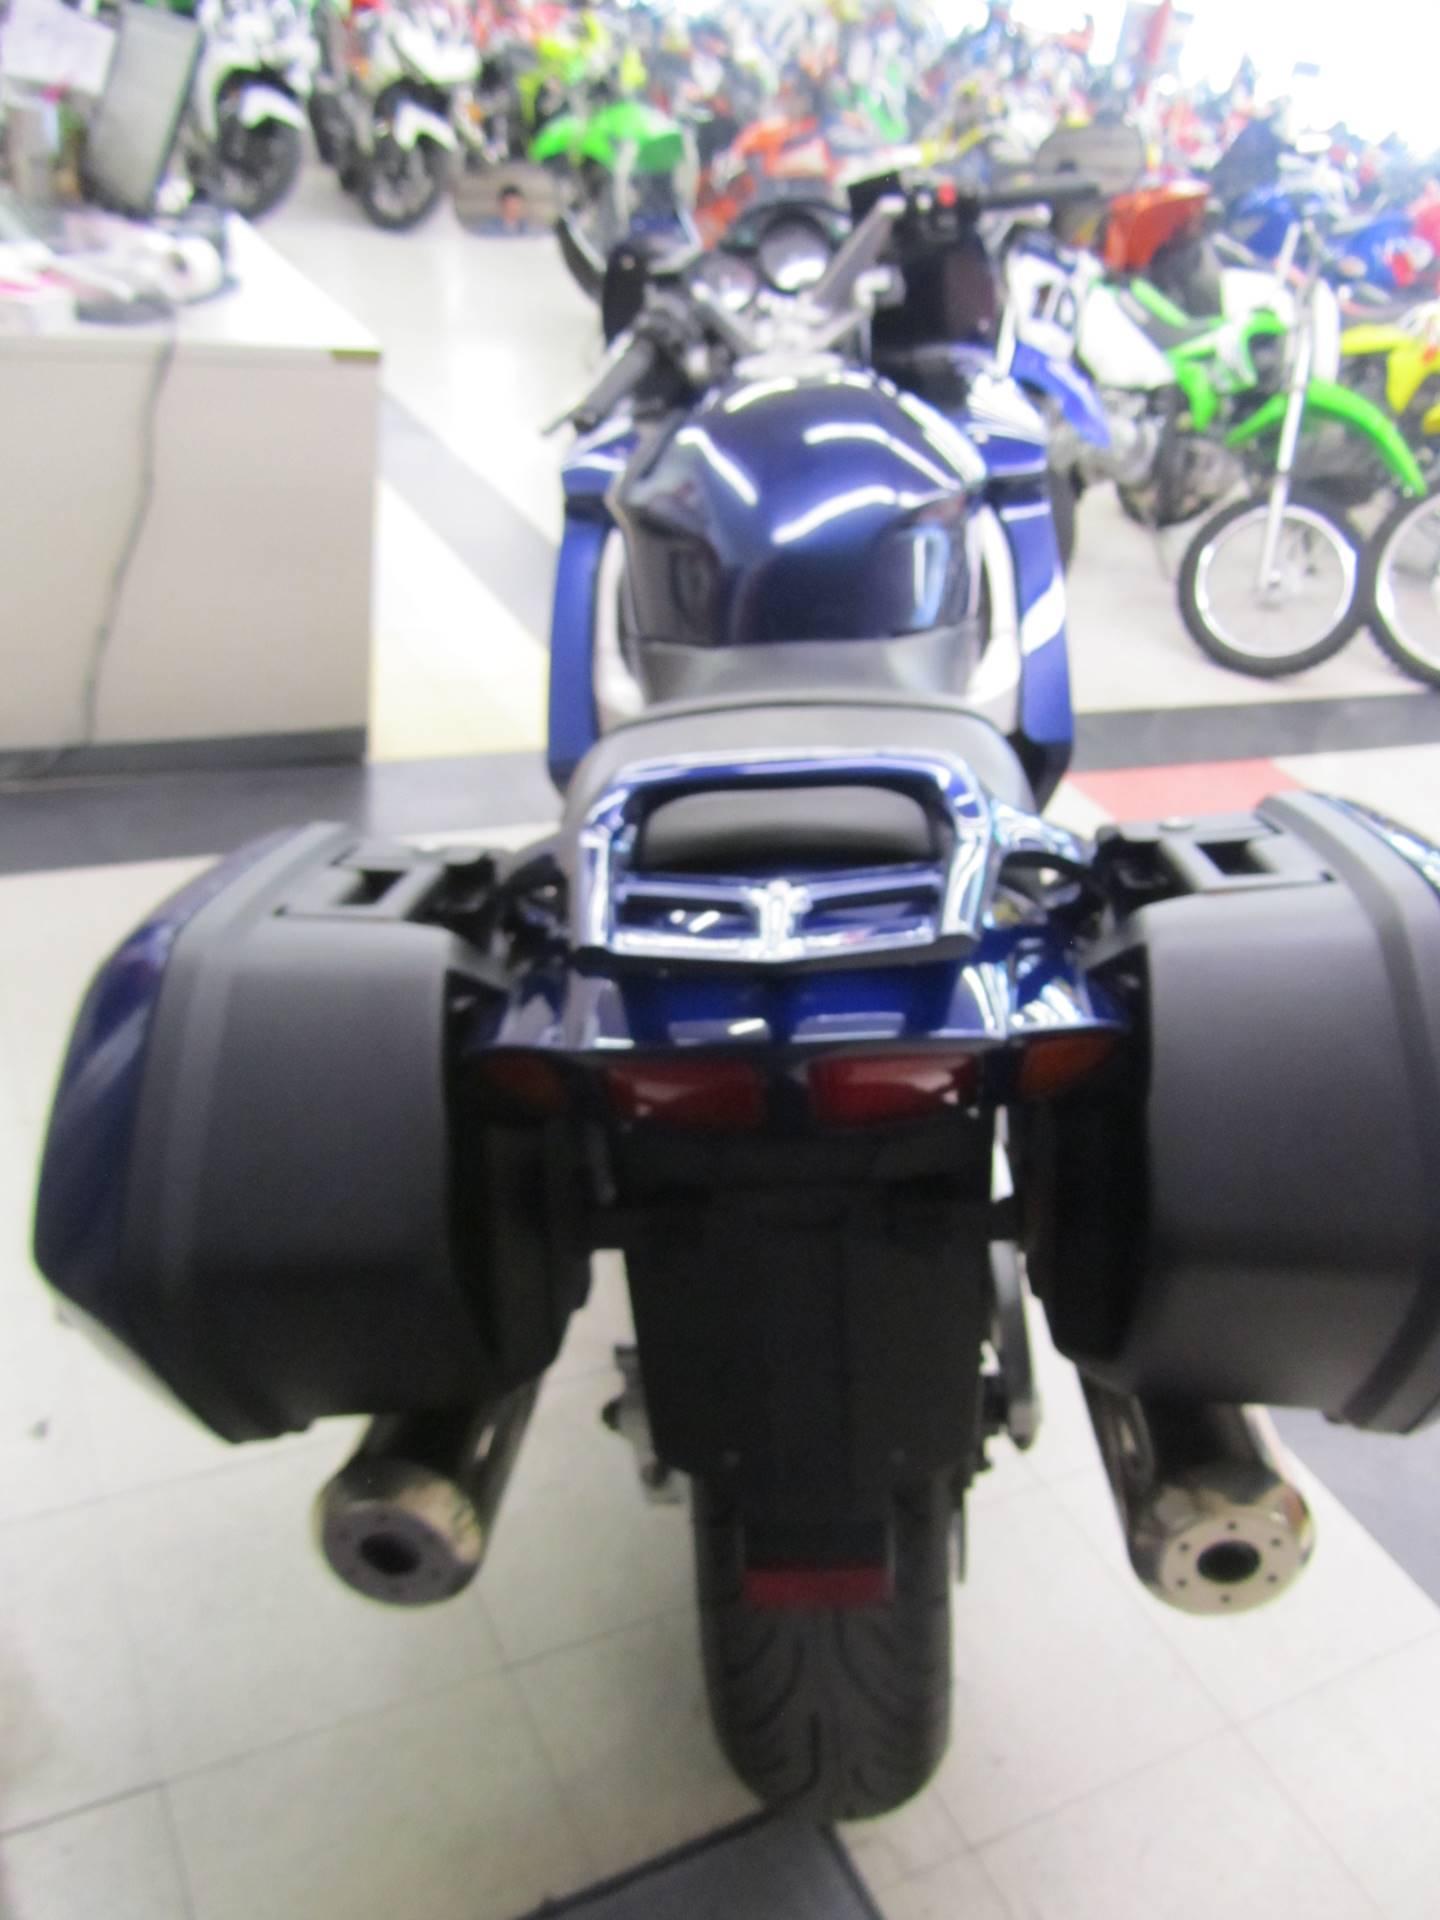 2005 Yamaha FJR 1300A 8